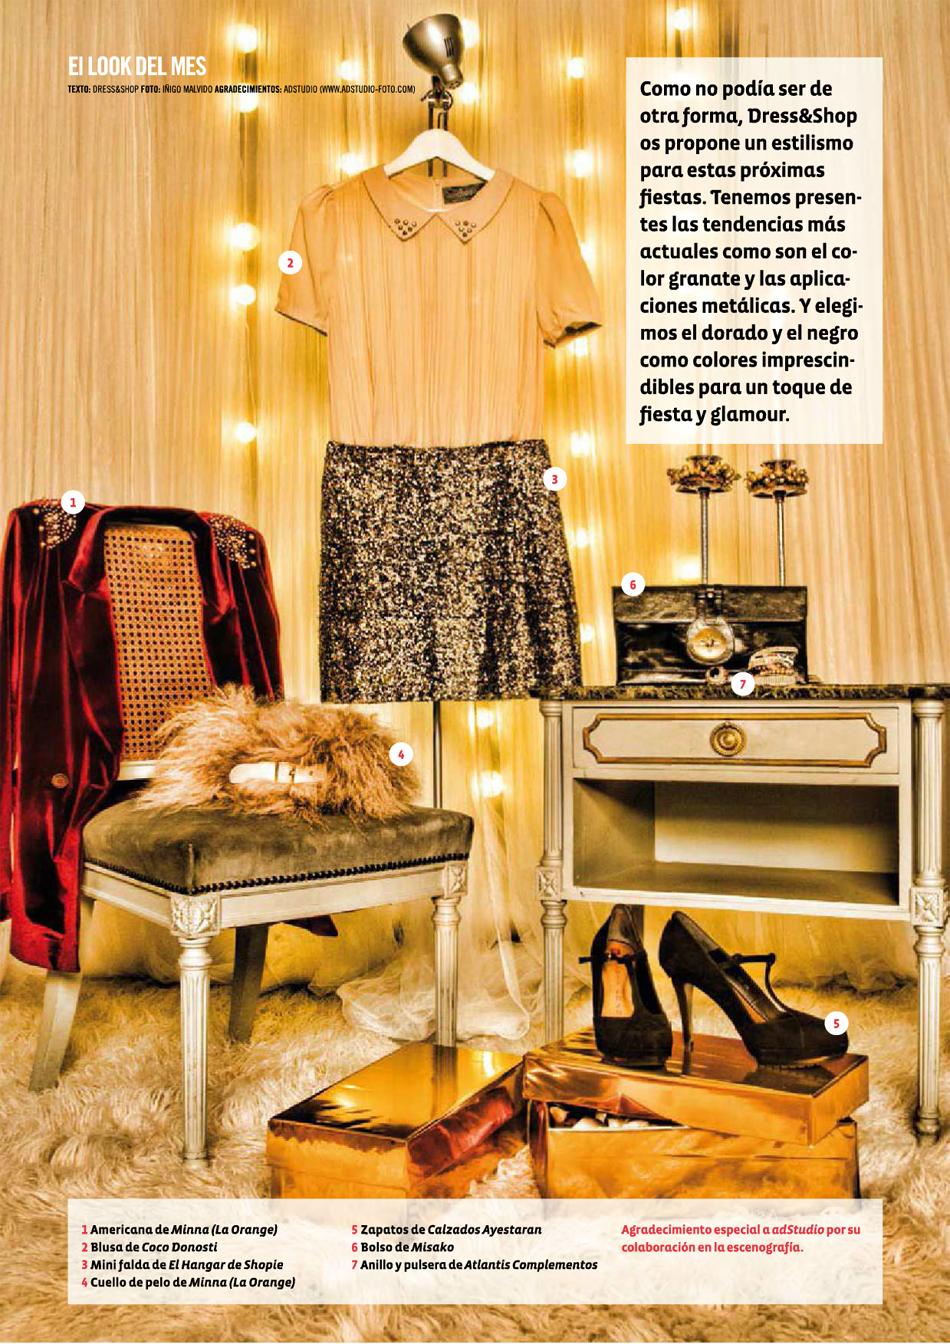 943 Magazine / Look de diciembre